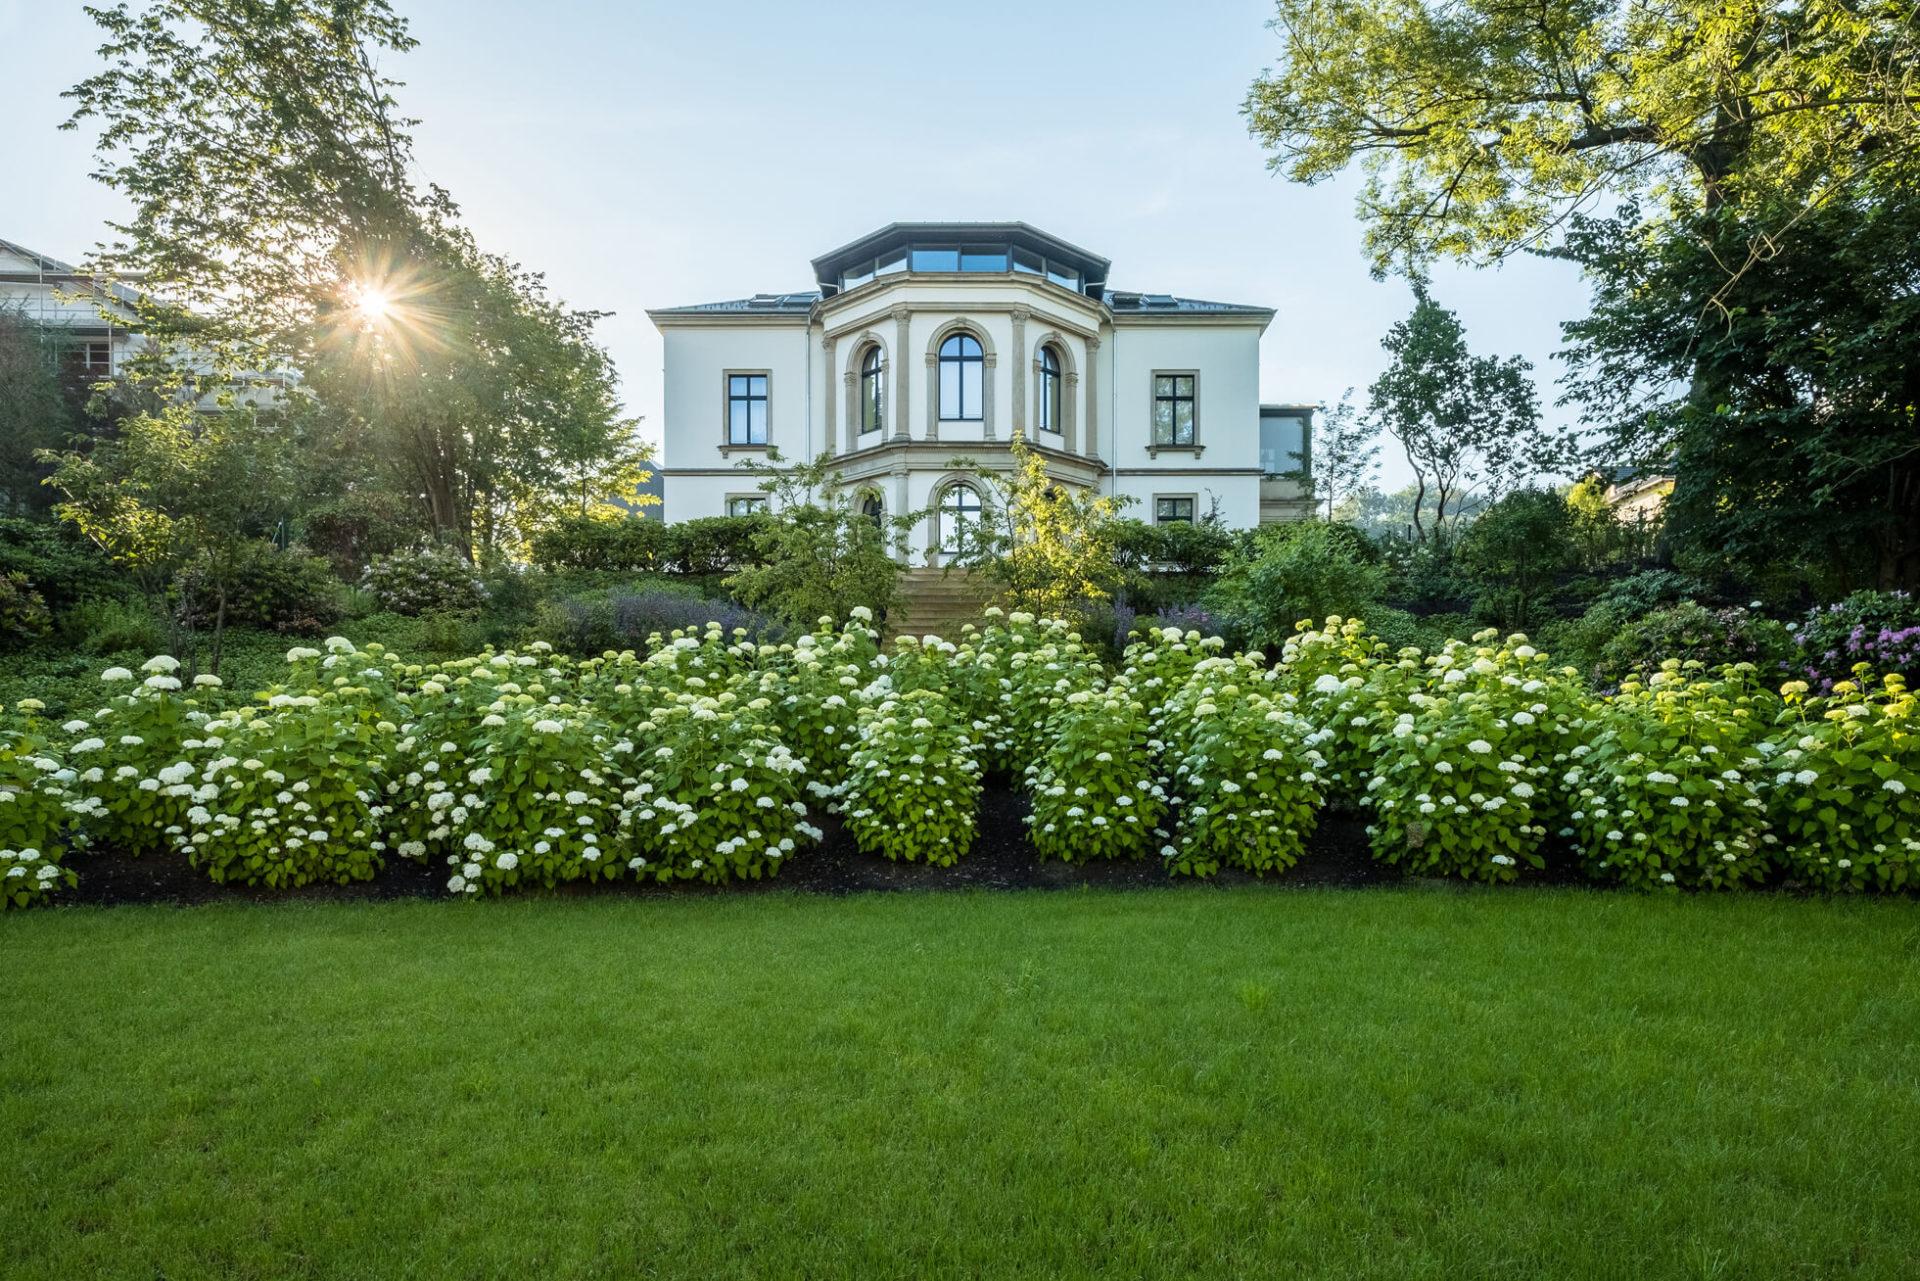 gartenmanufaktur-nuessler-garten-dresden-hortensien